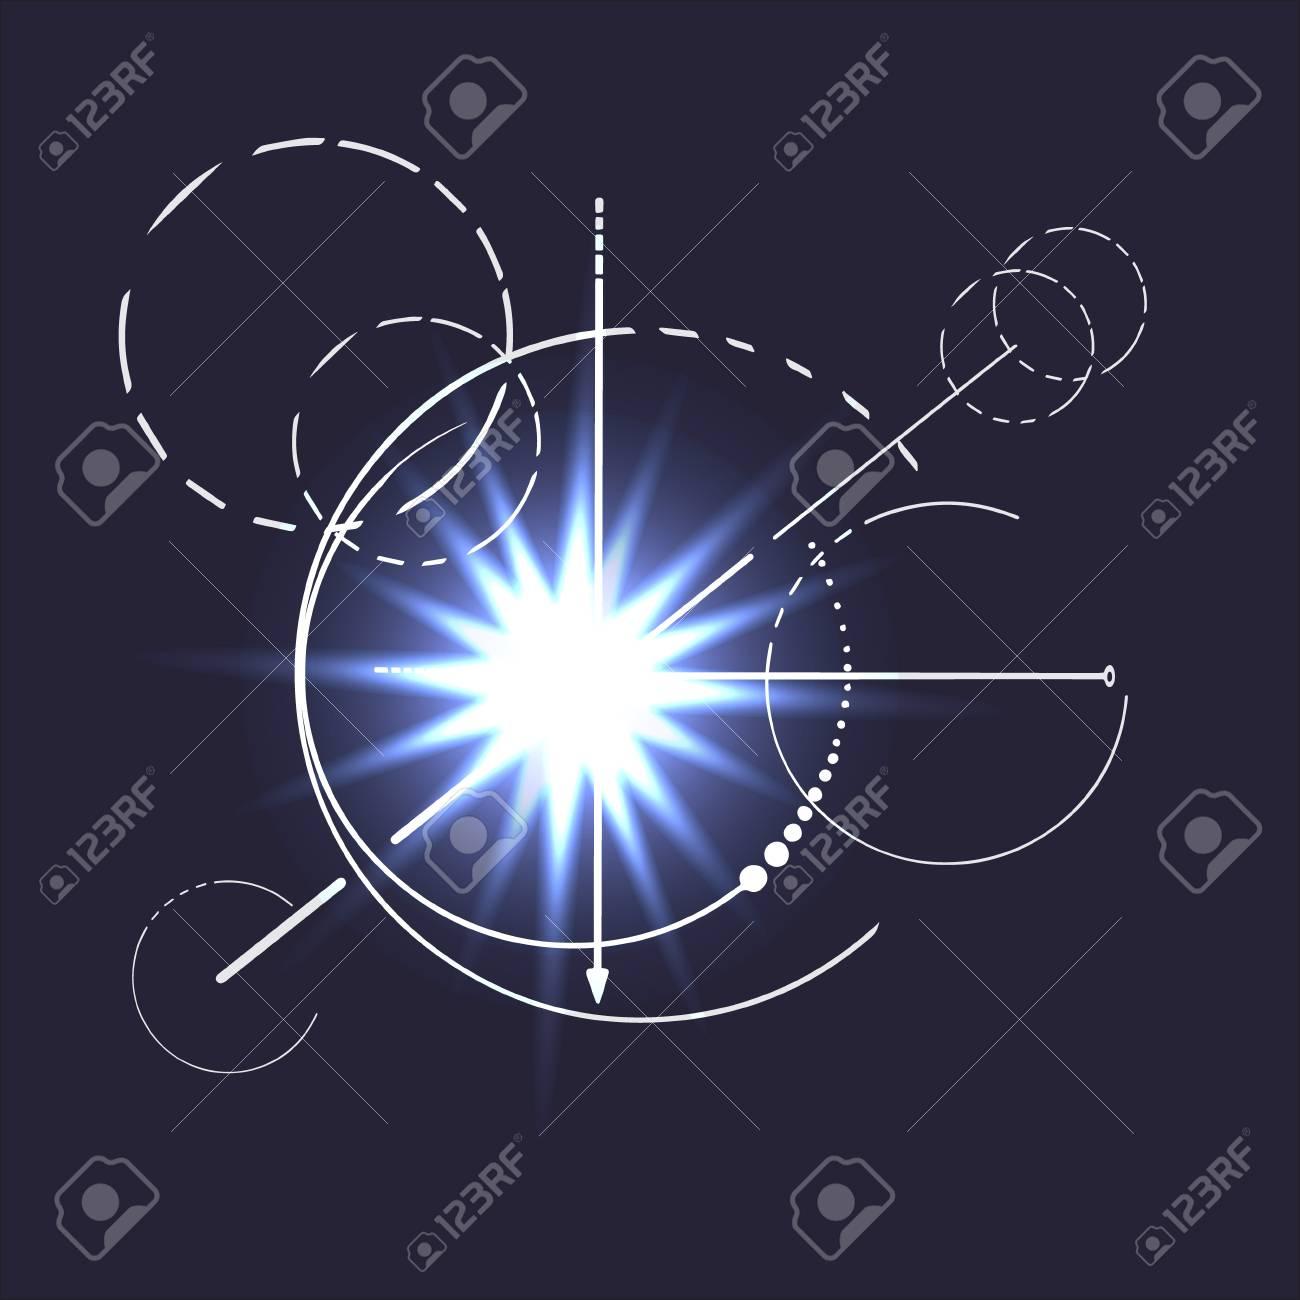 Geometry shine ray star scheme sacred line circle diagram symbol geometry shine ray star scheme sacred line circle diagram symbol on dark background stock vector ccuart Choice Image